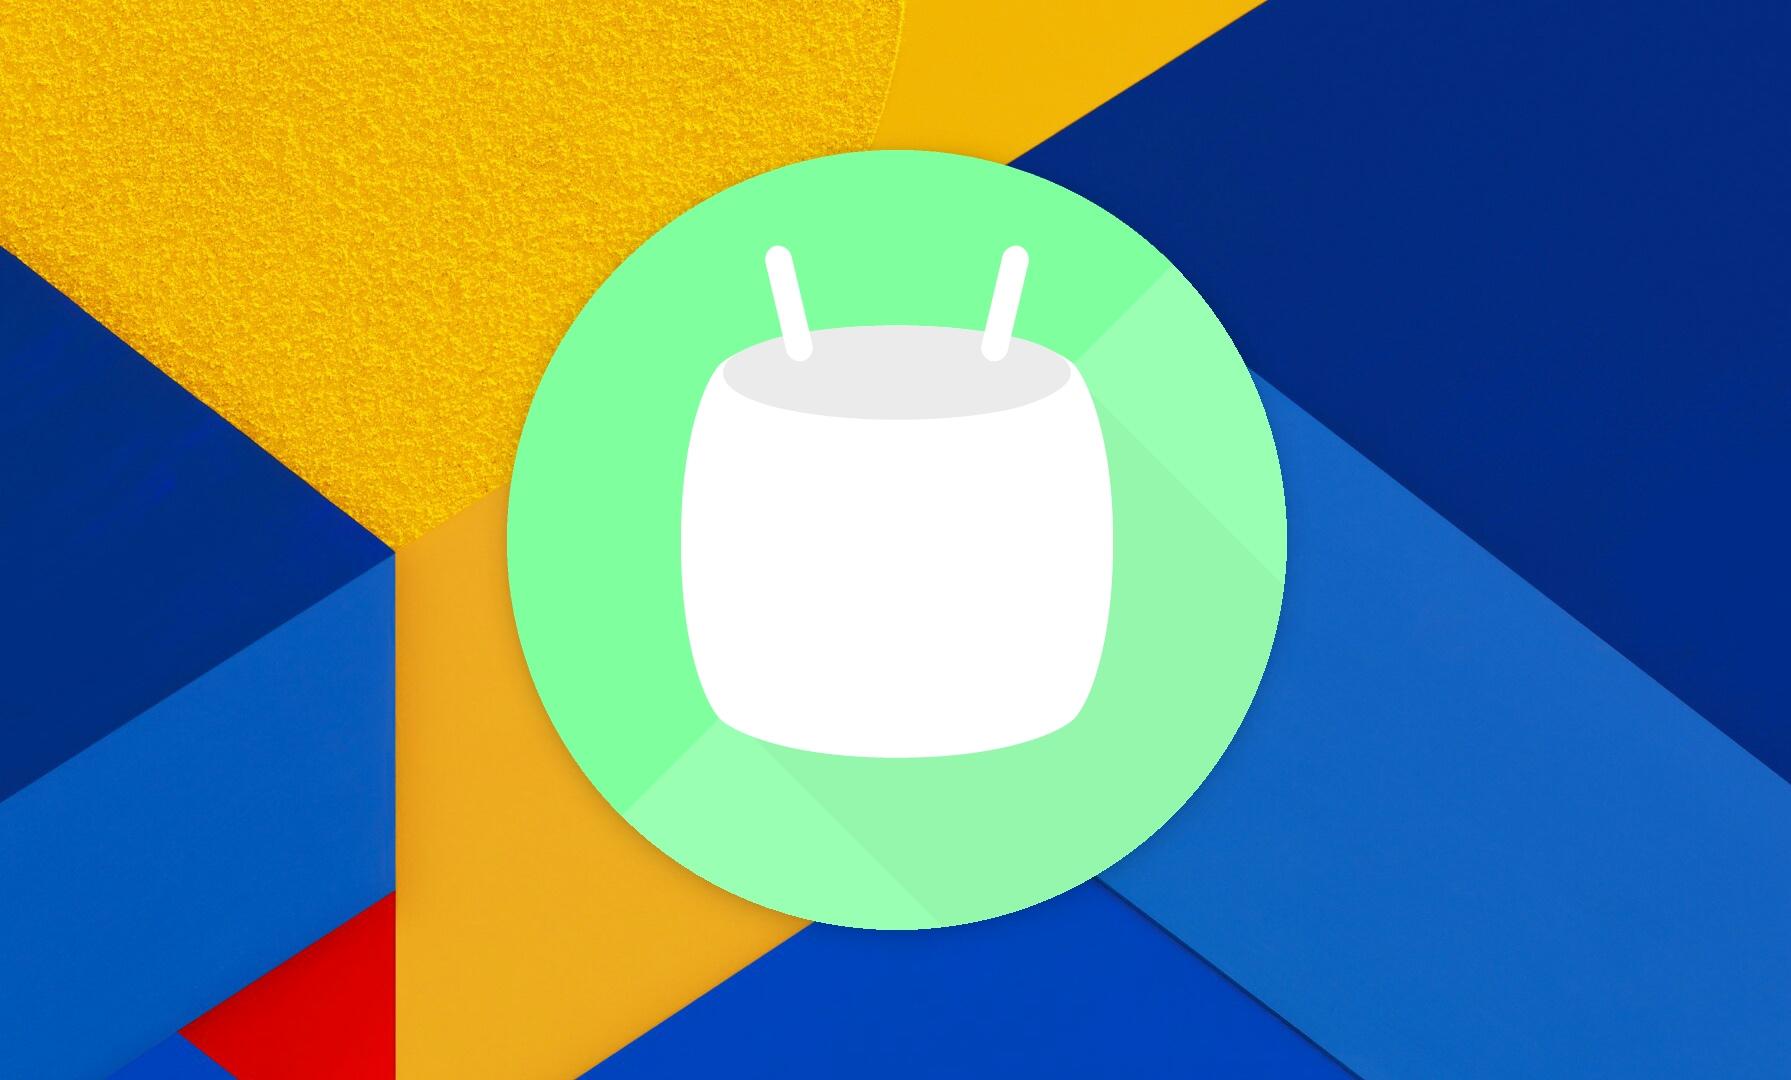 http://cdn.arstechnica.net/wp-content/uploads/2015/10/Android-M.jpg